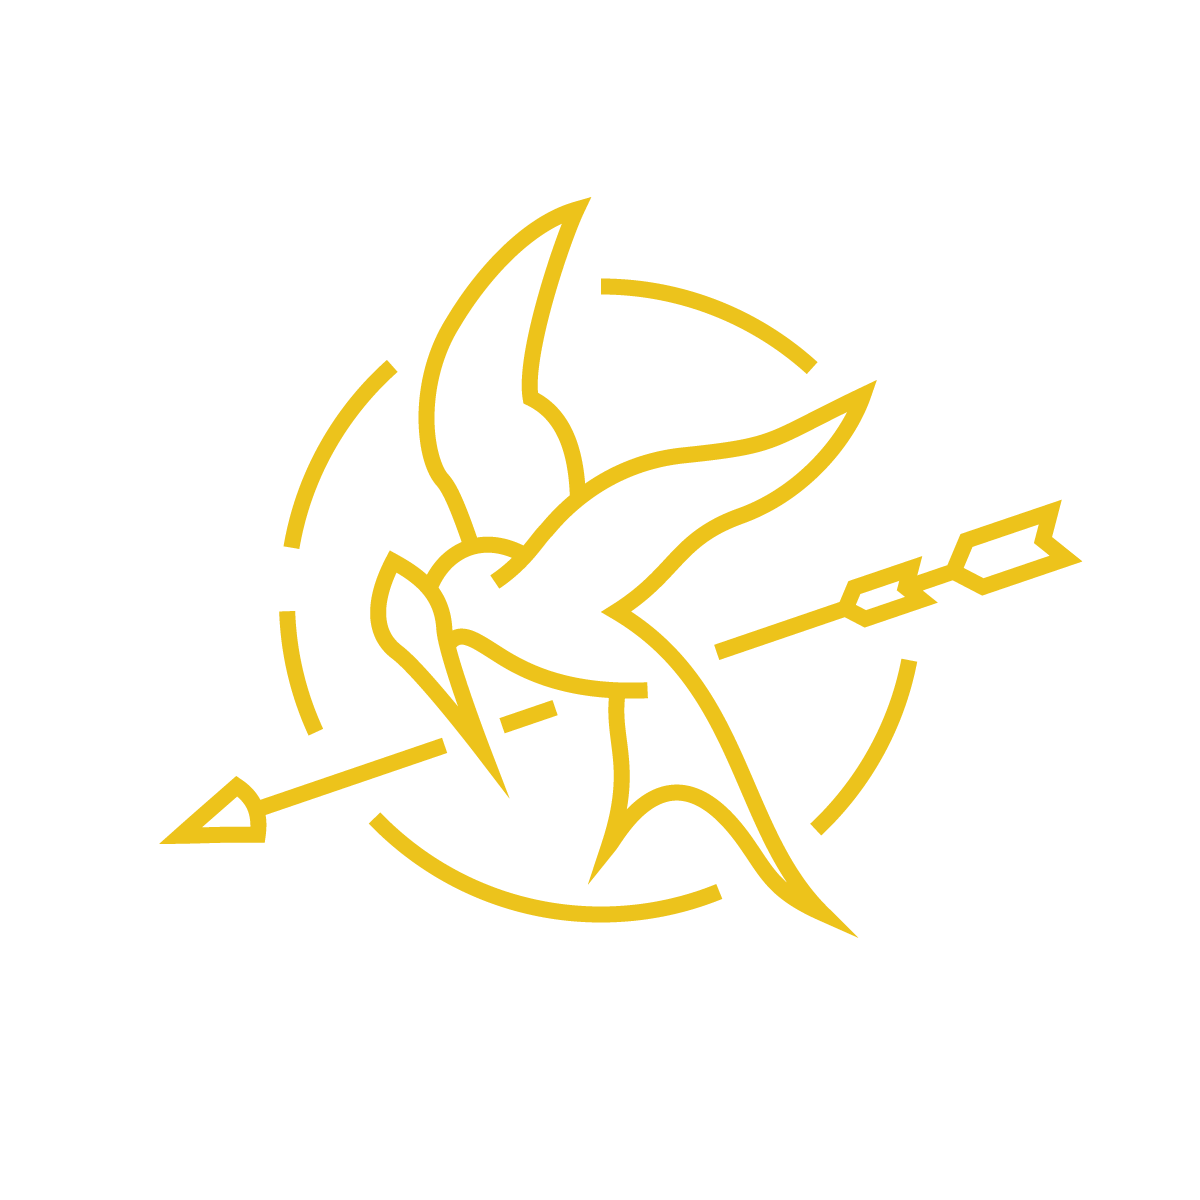 Mockingjay Symbol Black And Tattoo Art Pinterest Mockingjay